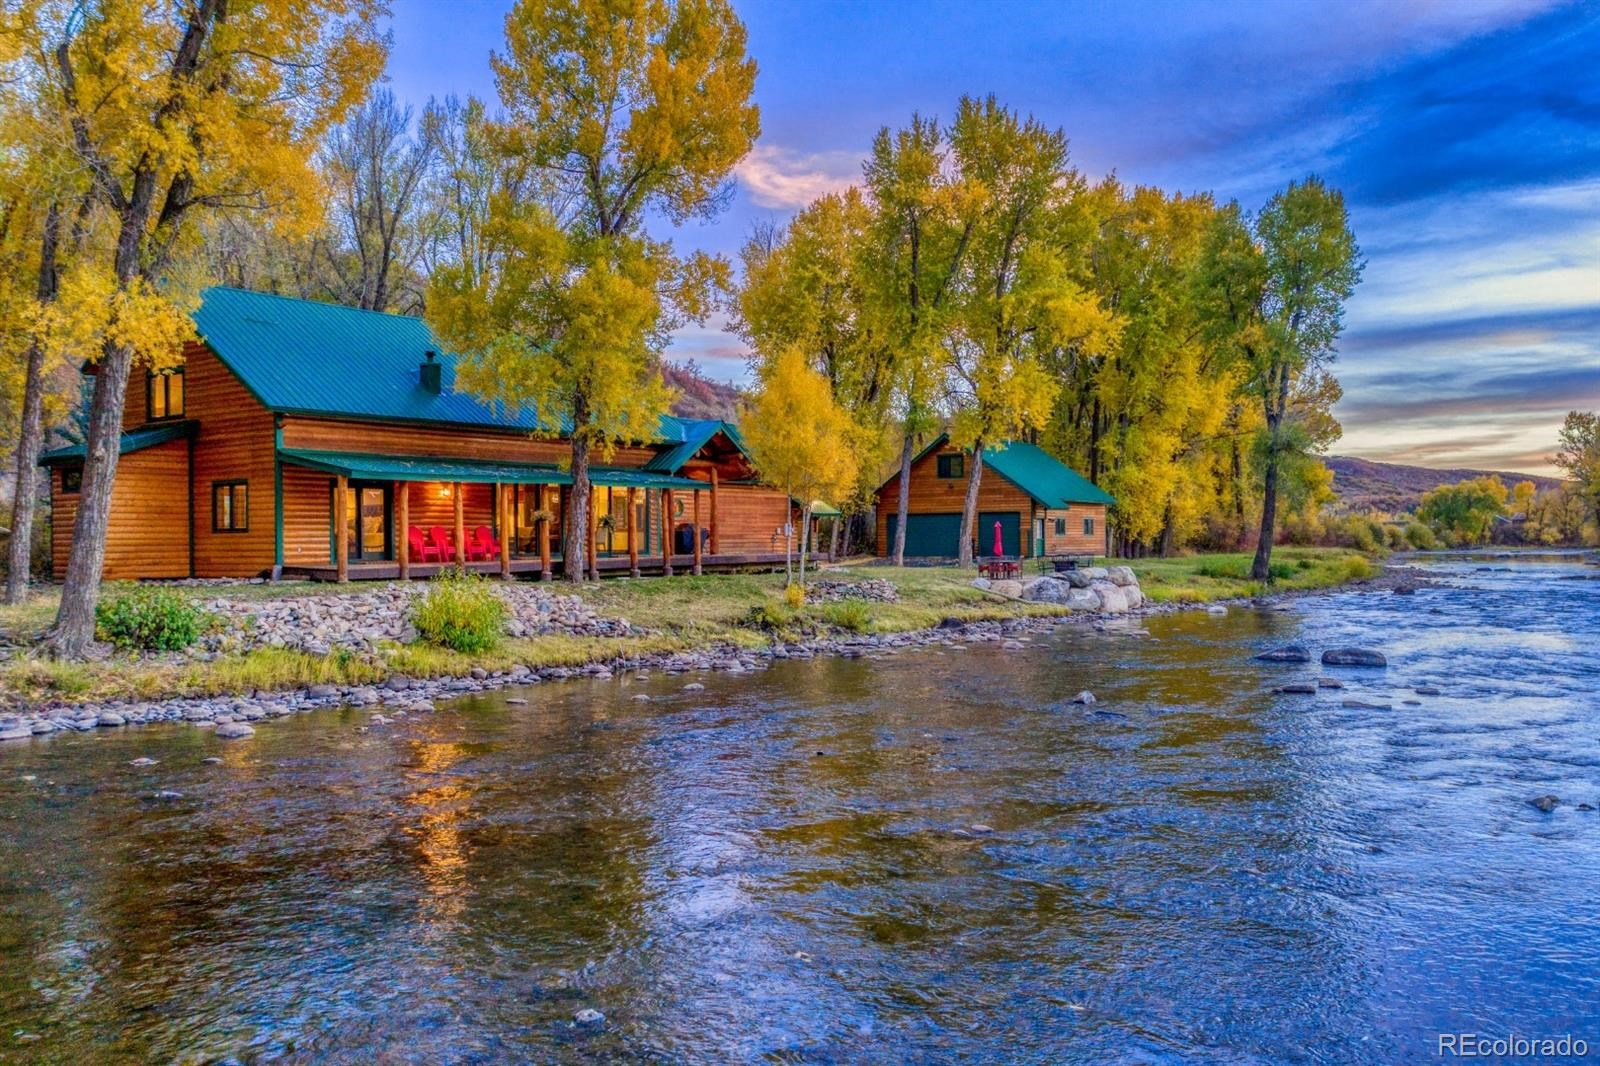 MLS# 4389755 - 1 - 43605  County Road 129, Steamboat Springs, CO 80487